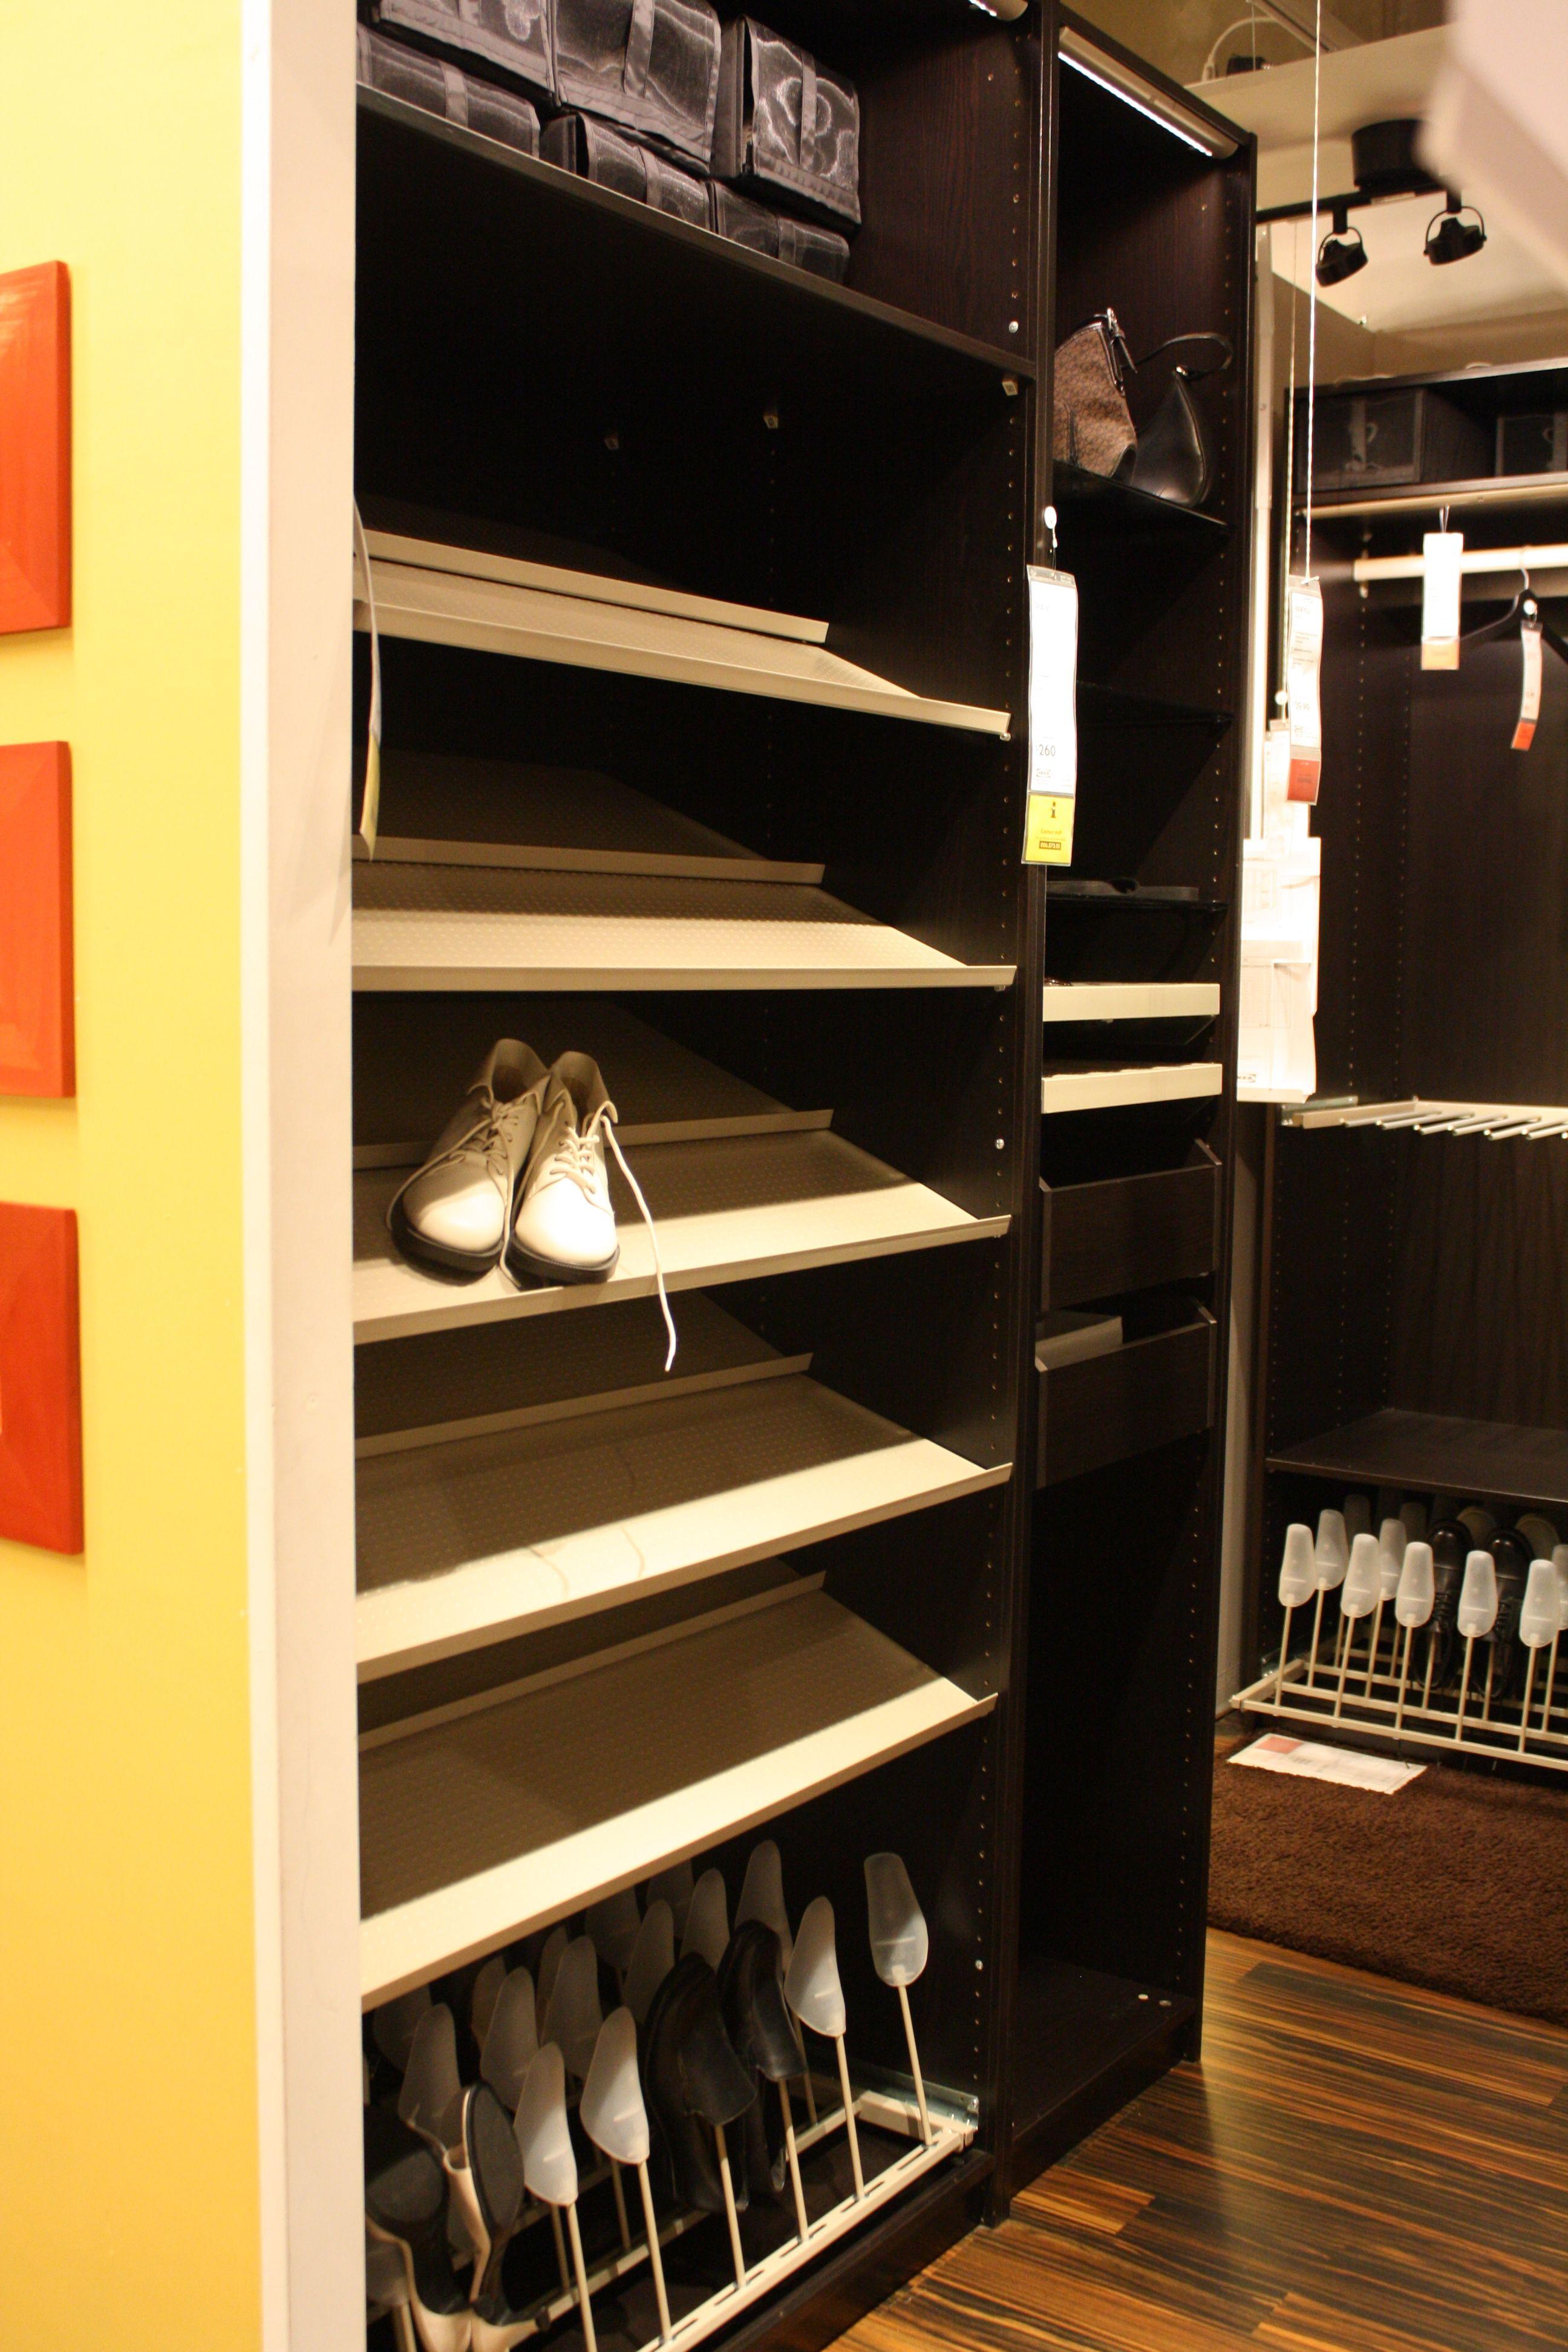 Ikea Closet organizer Ikea Closet organizer